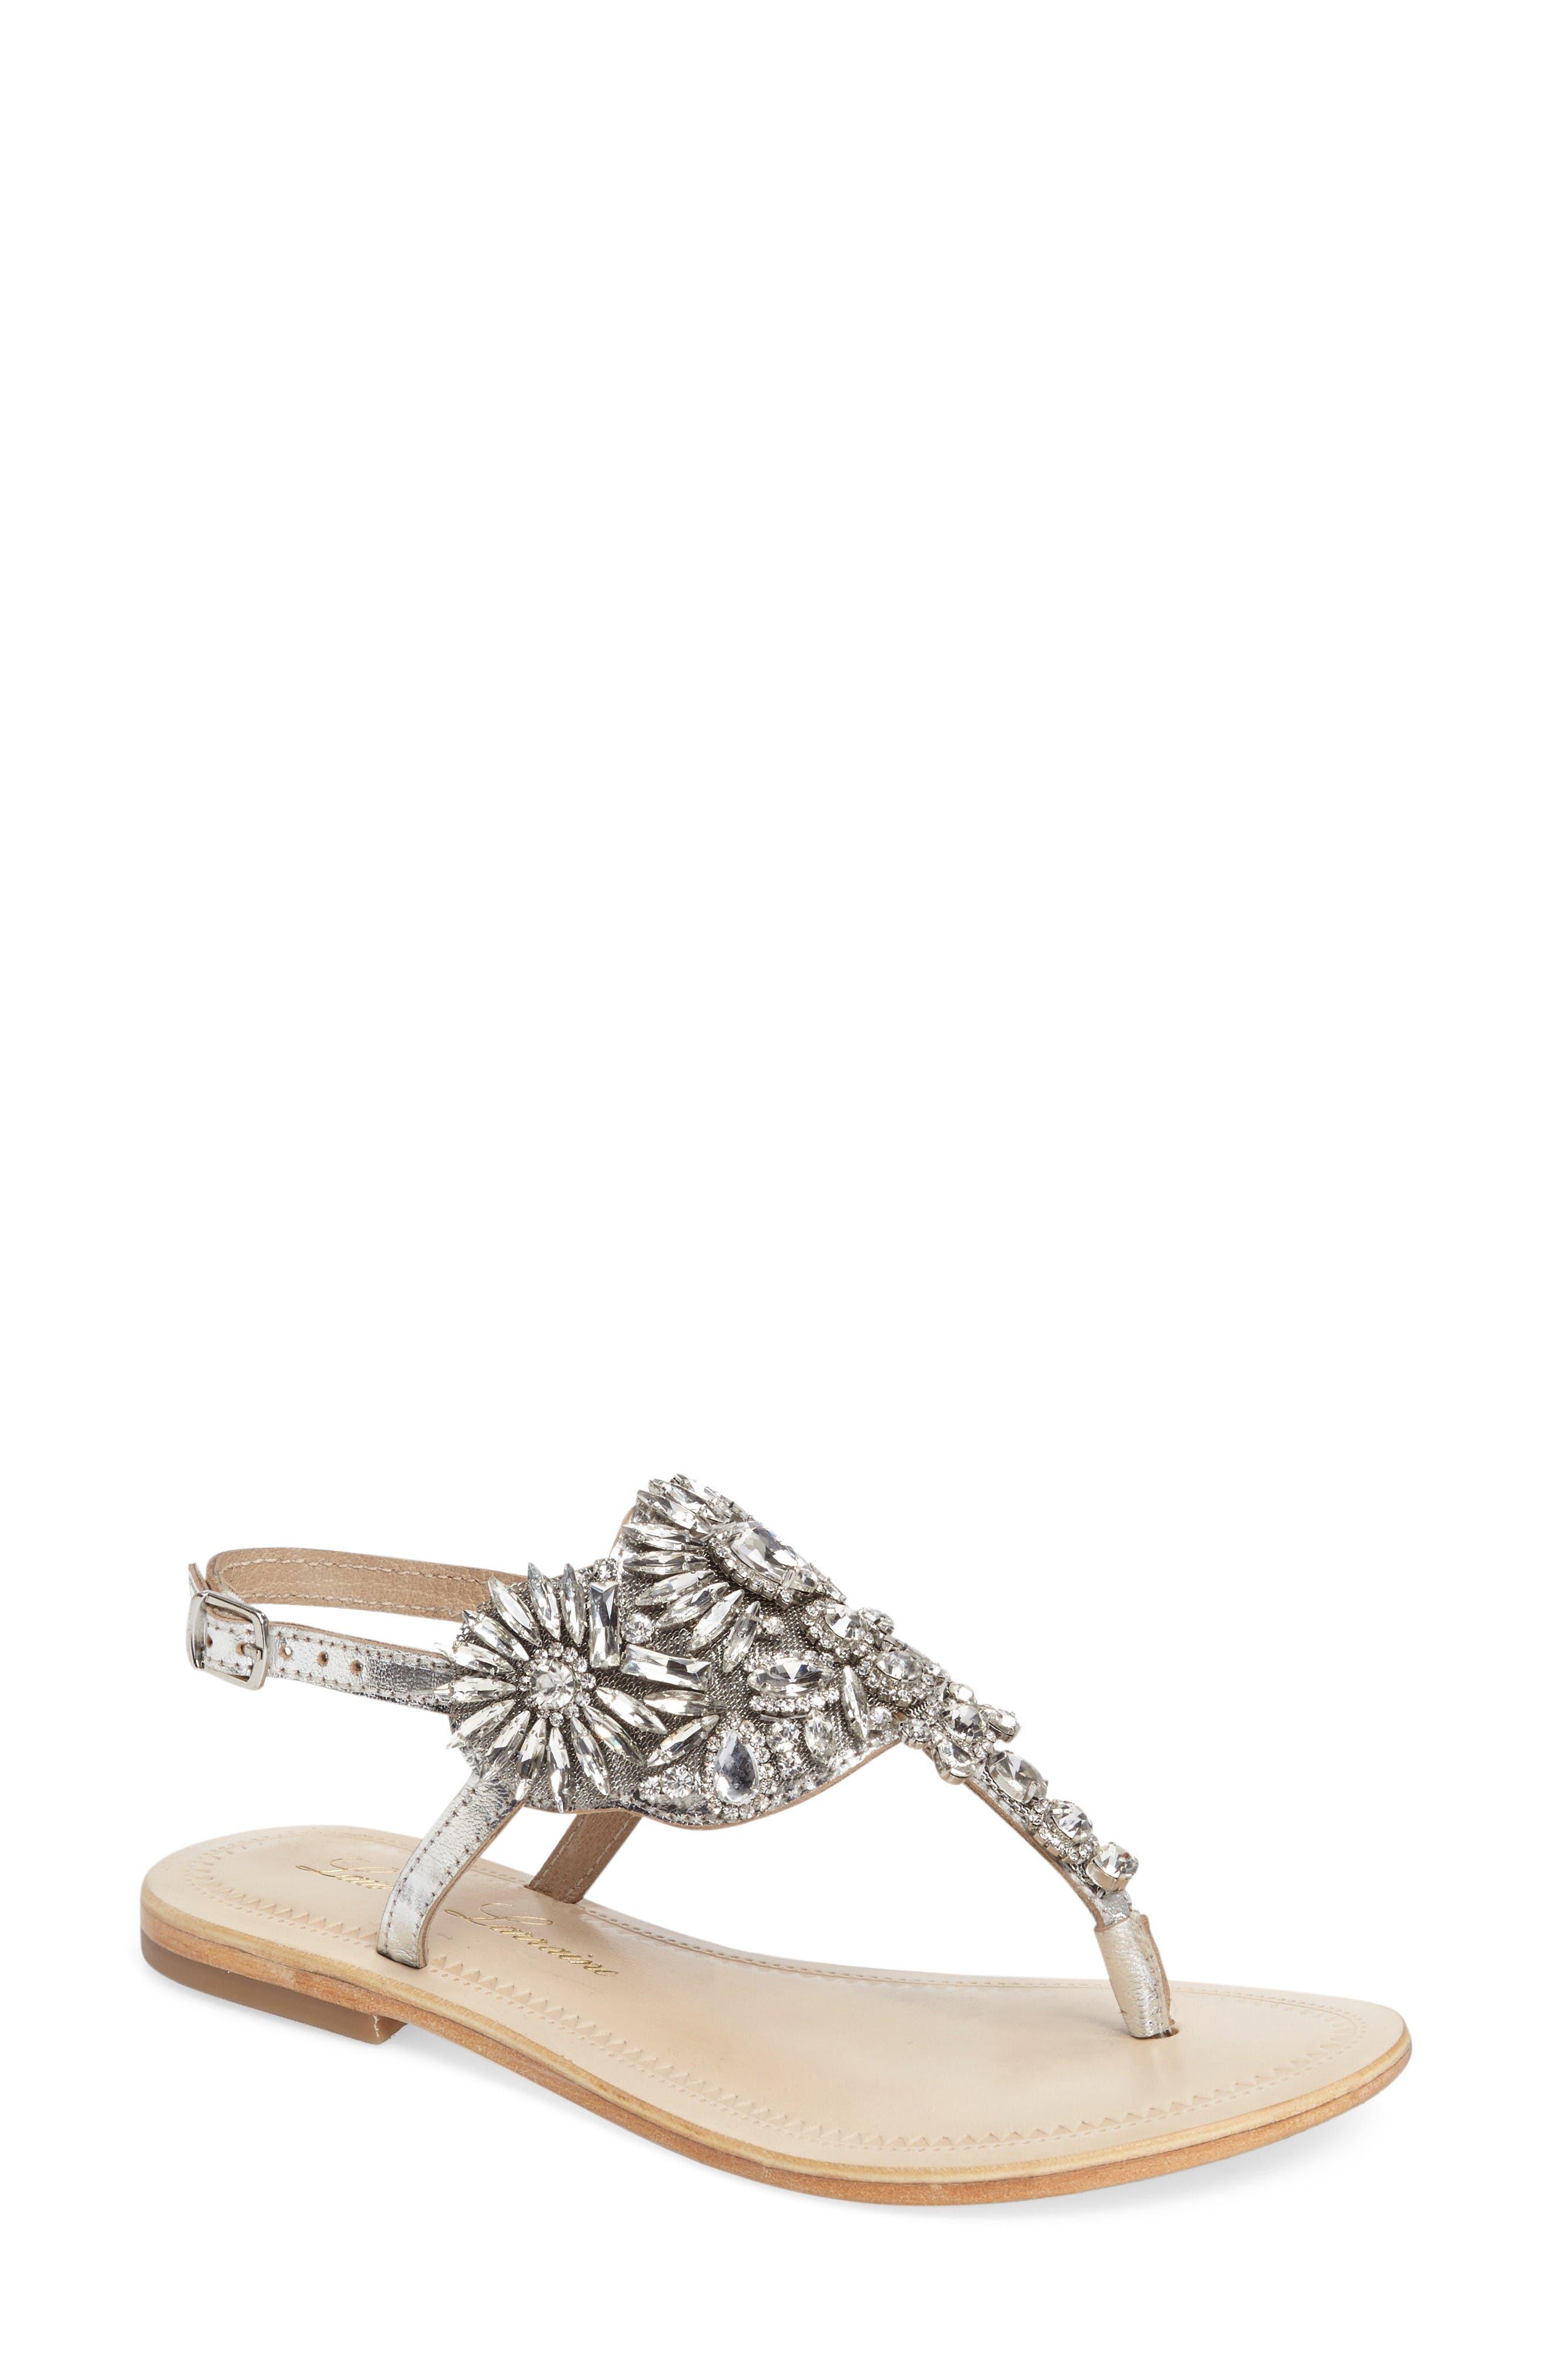 Lauren Lorraine Vera Embellished Sandal (Women)